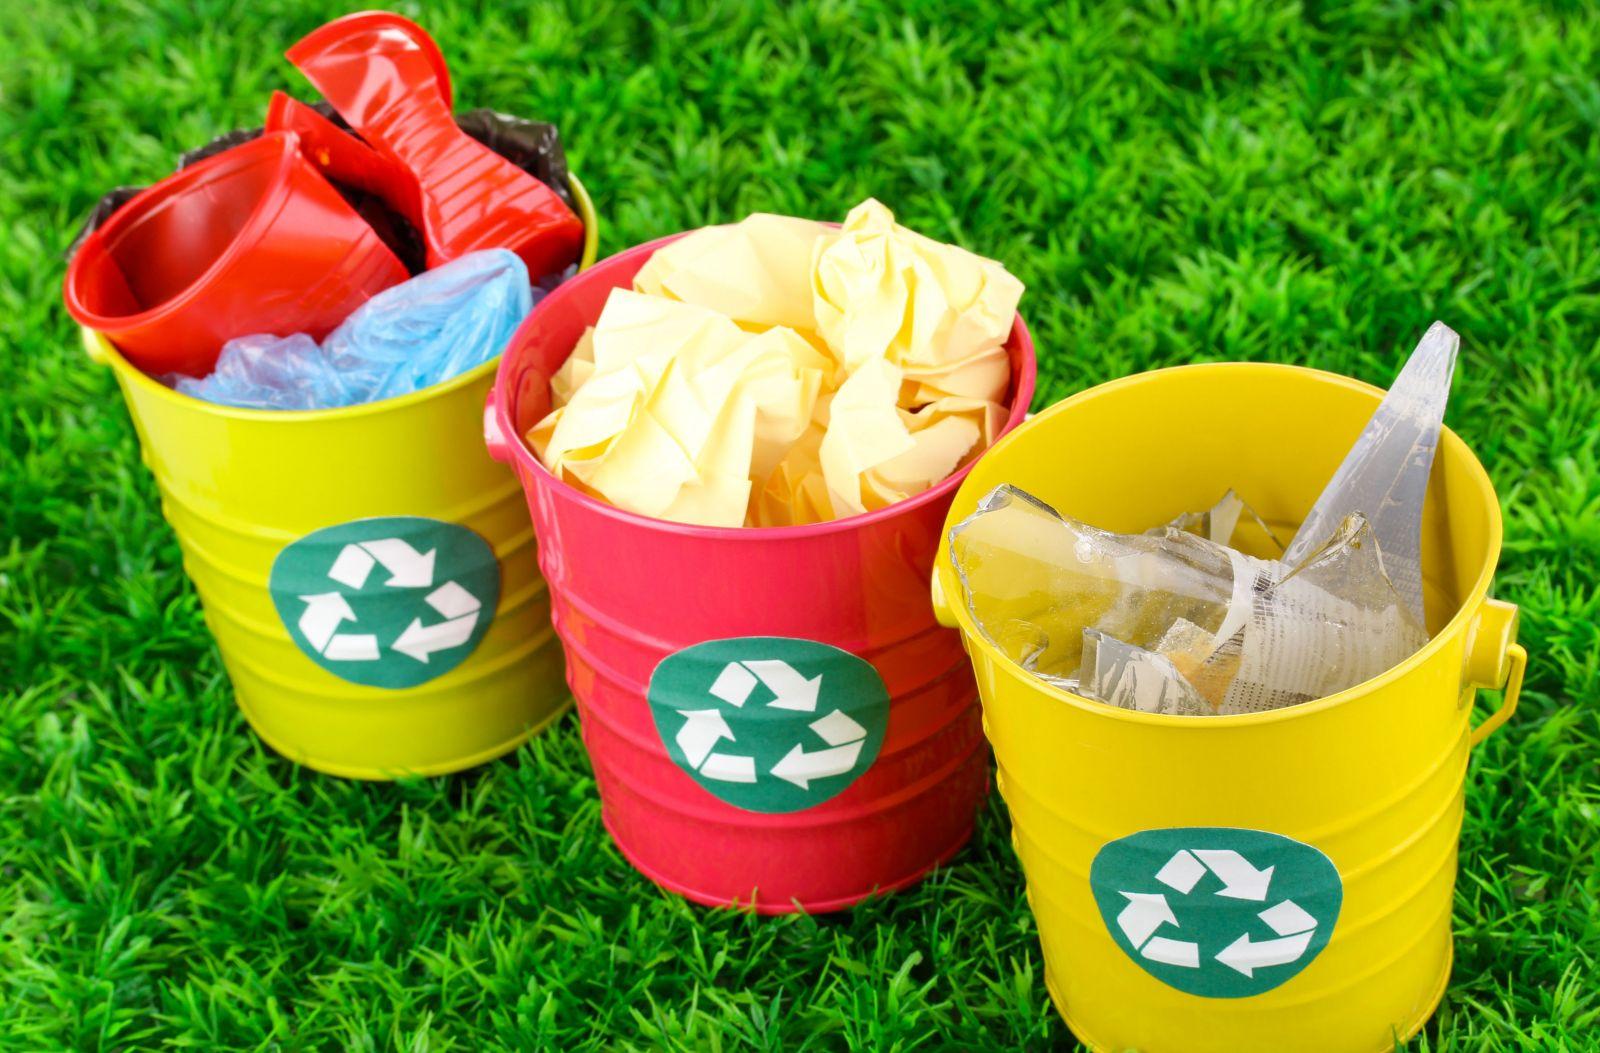 Recyclingsystem in Deutschland